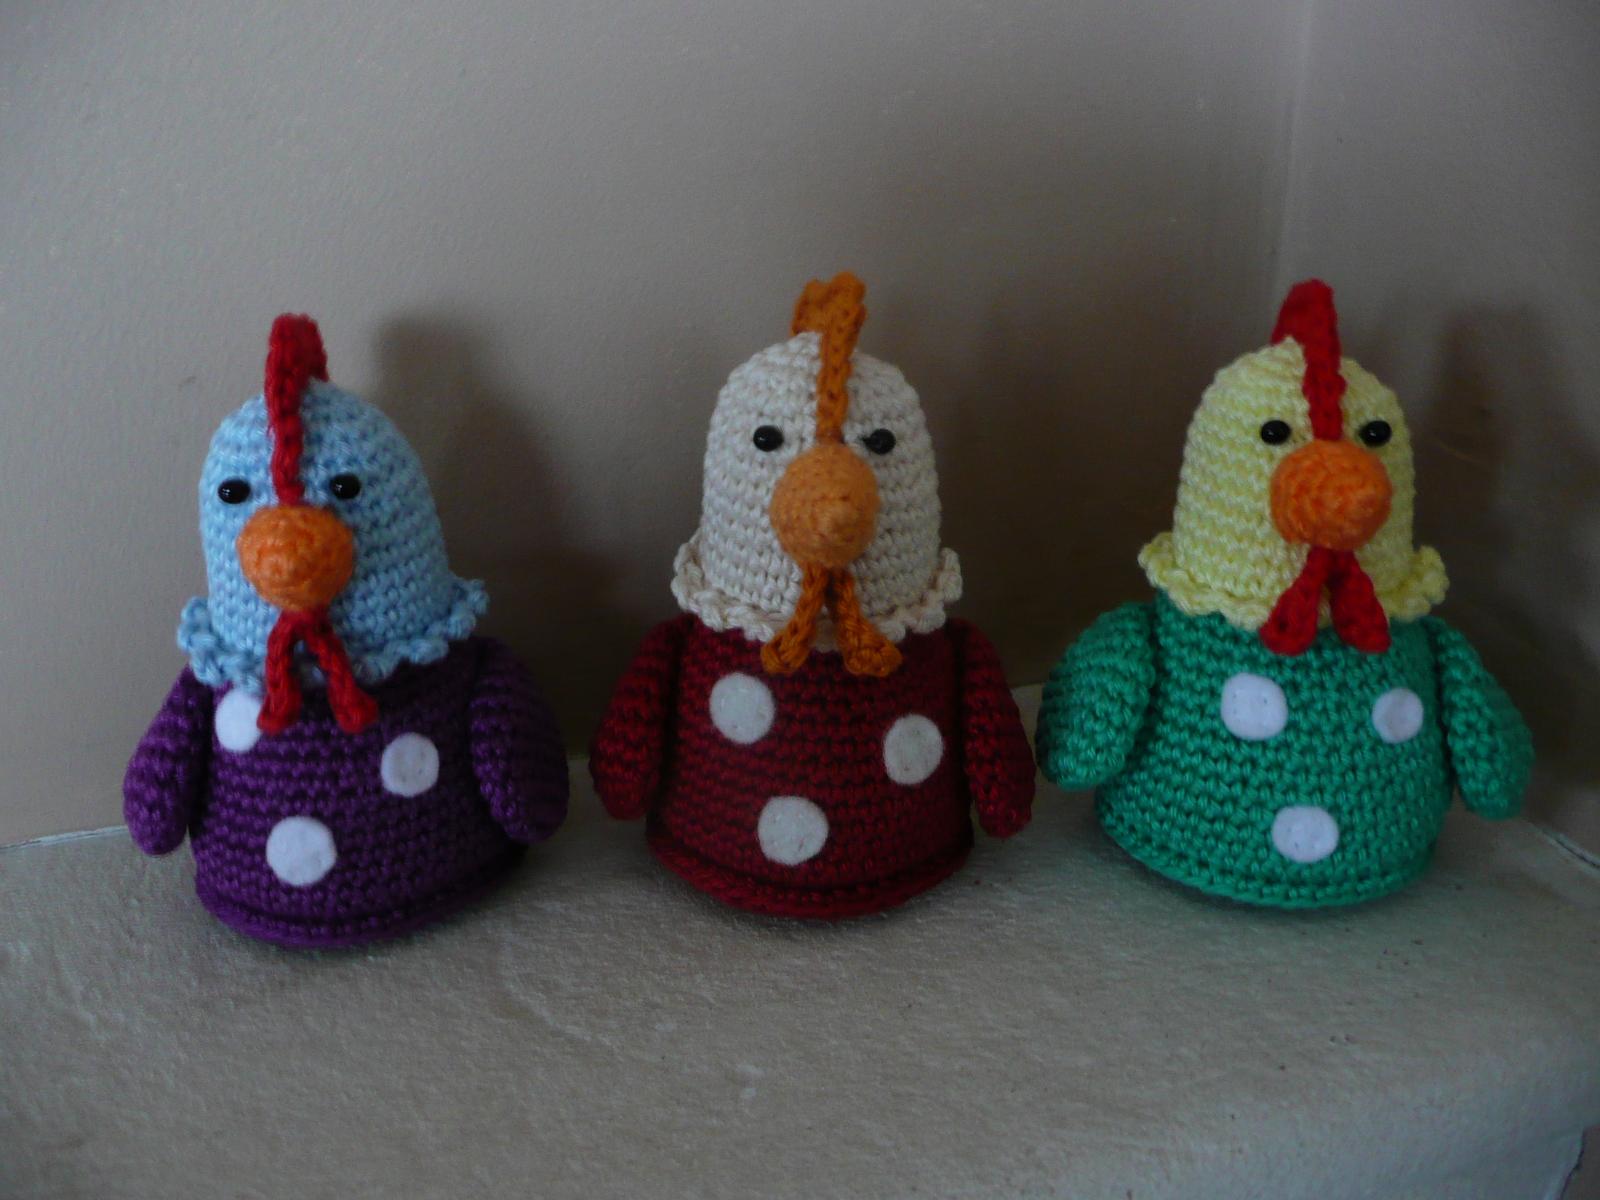 vera's home made: toompje kippen